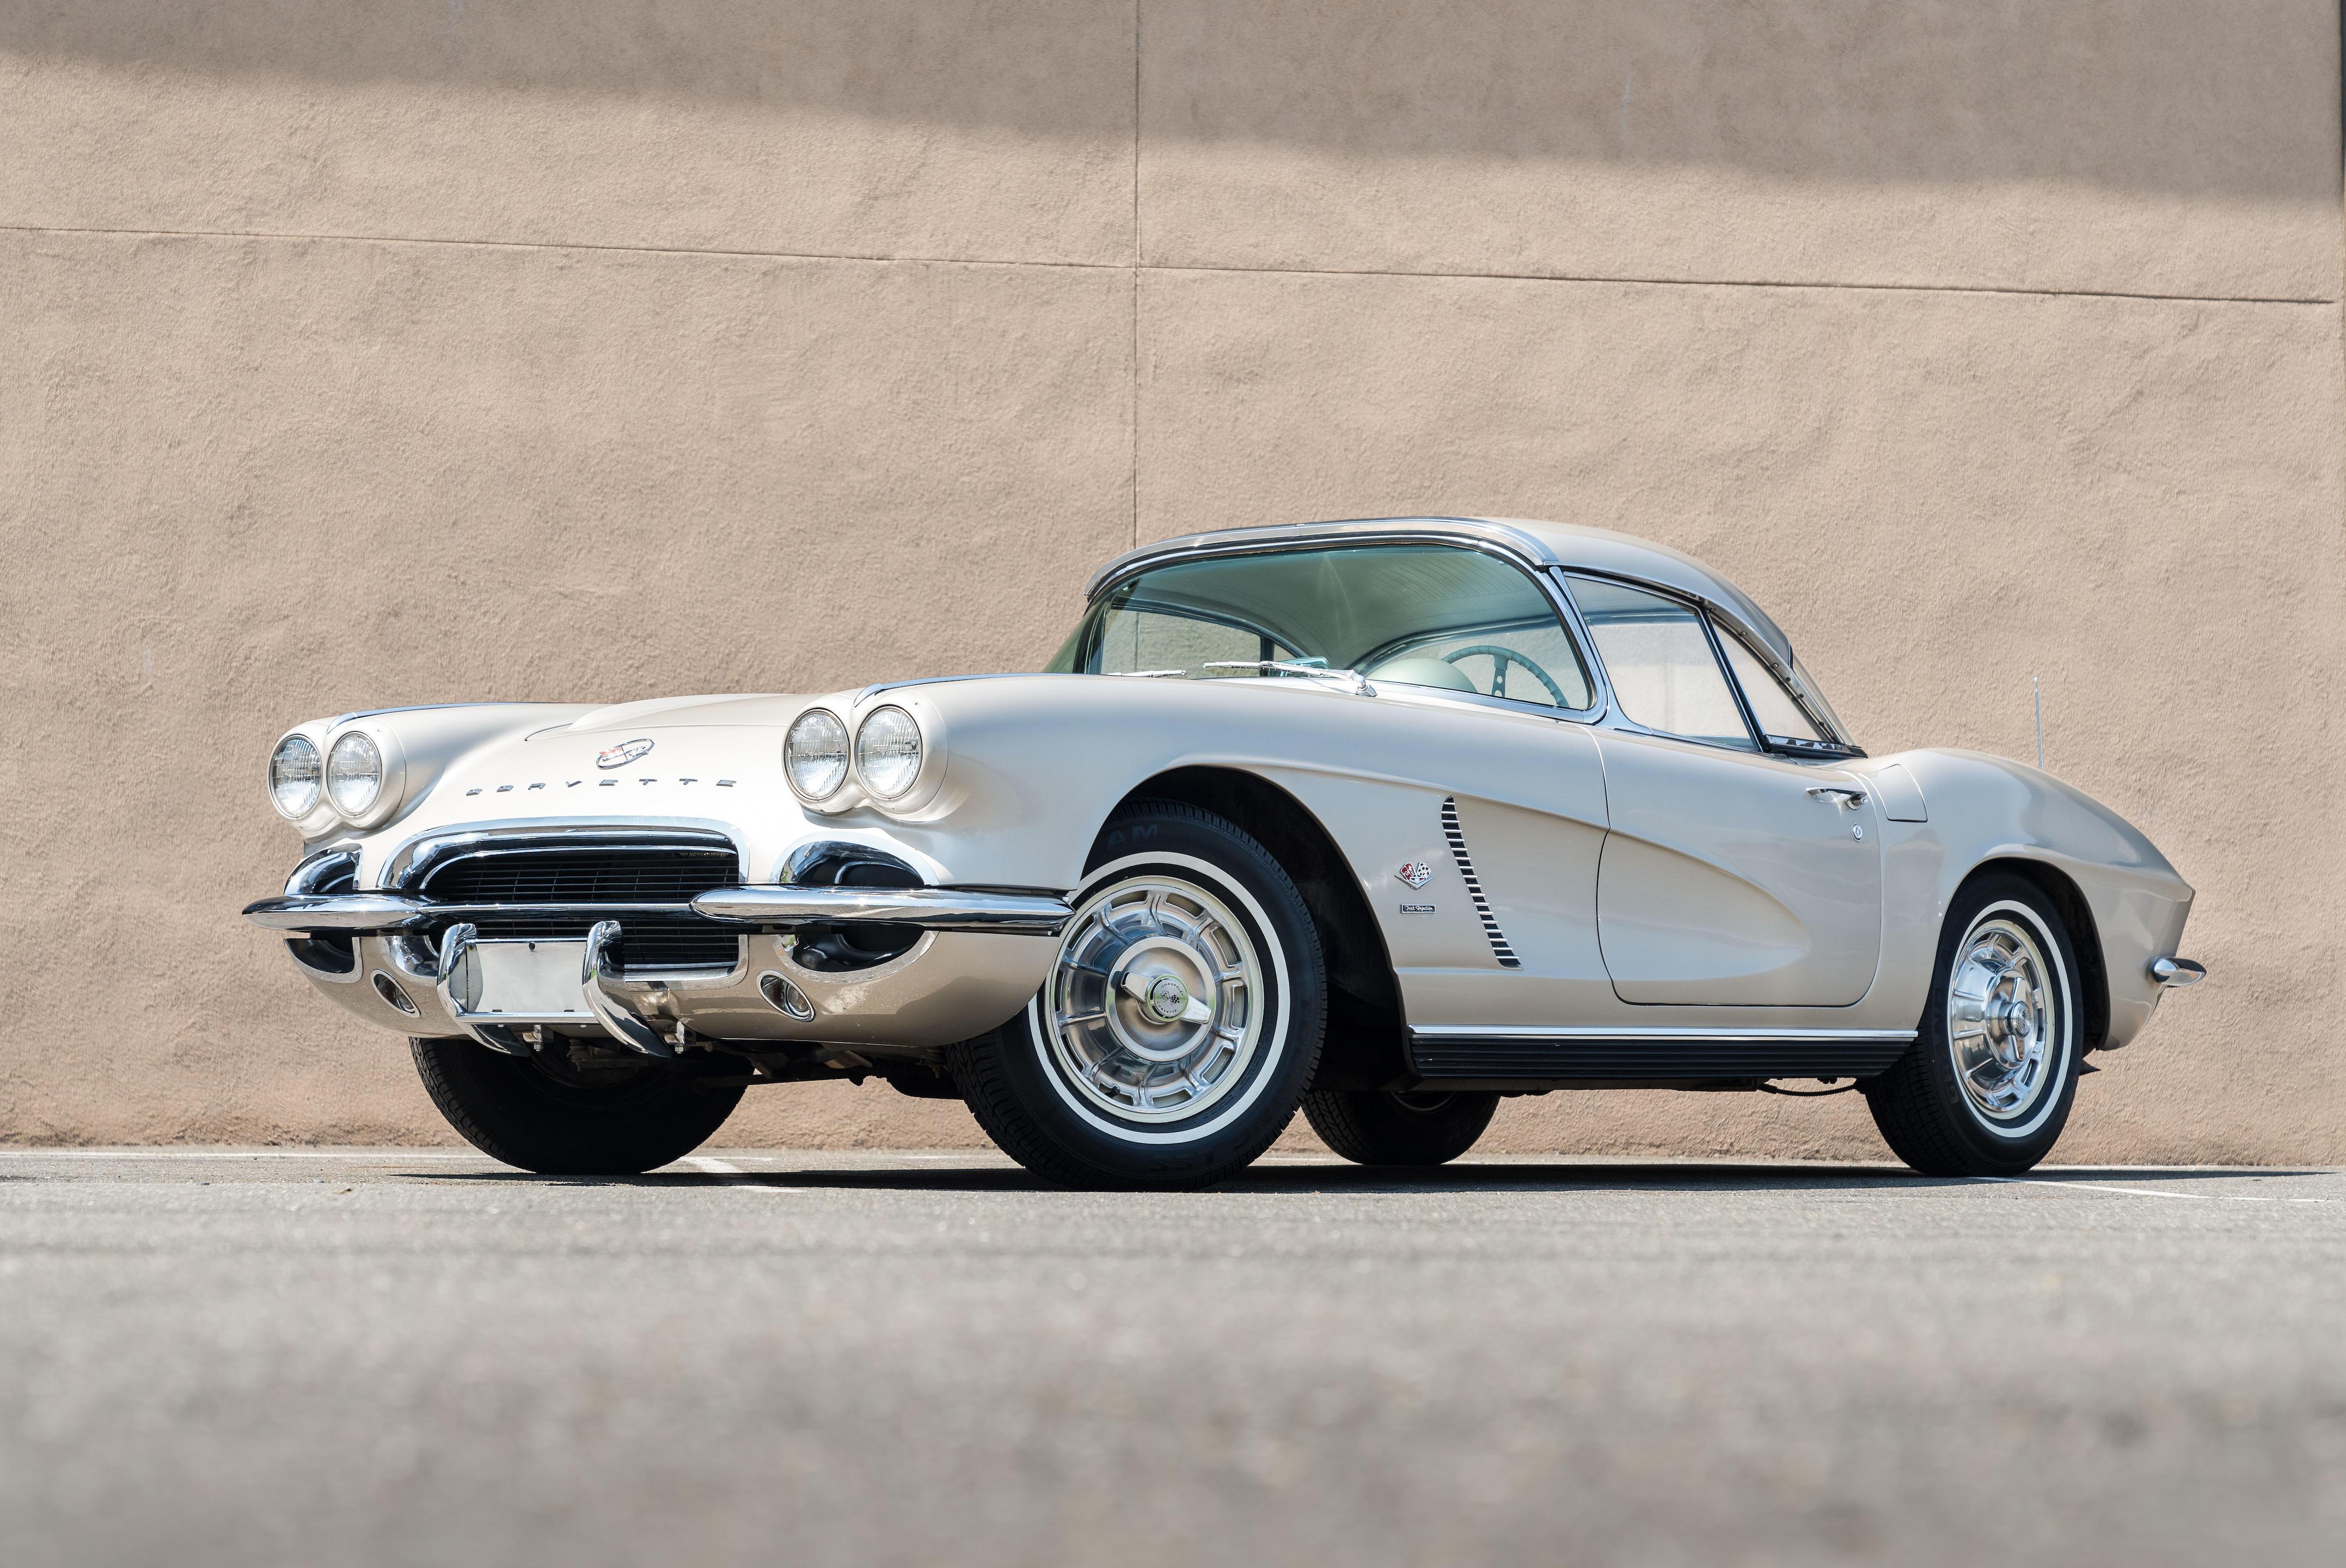 1962 Chevrolet Corvette Roadster Chassis no. 20867S101783